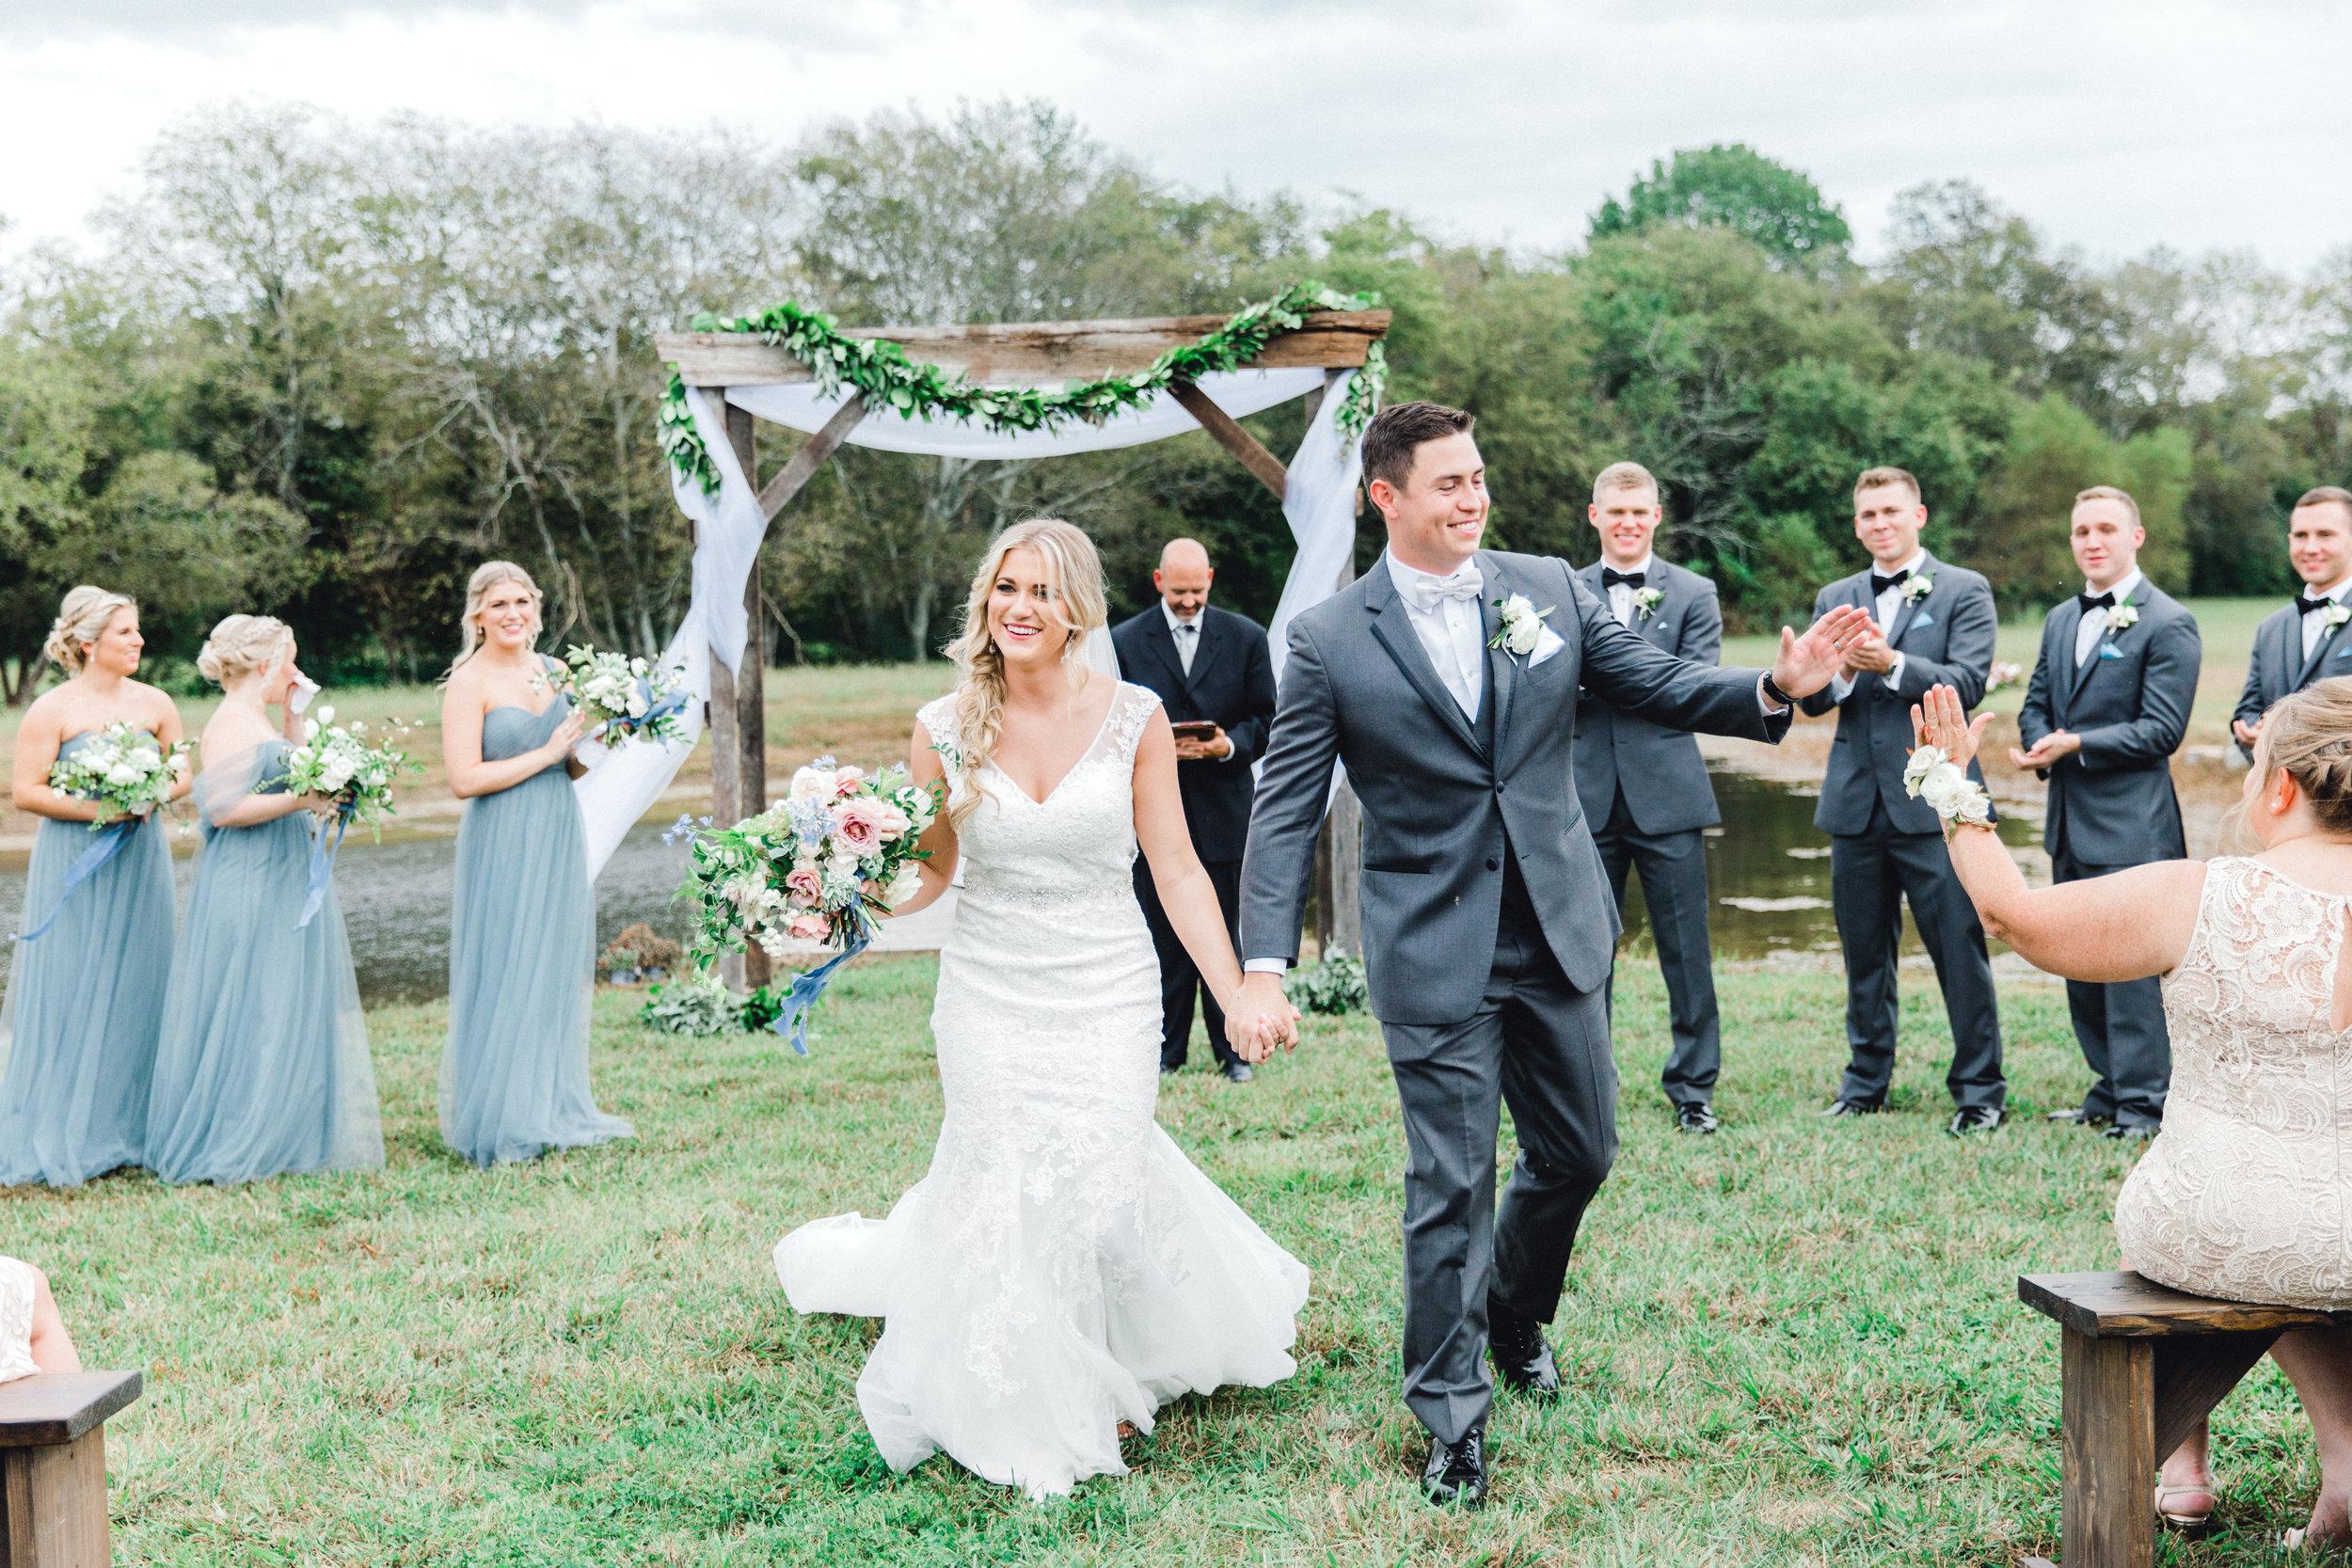 Paige-Mercer-Photography-Florida-Wedding-Photographer-Alyssa&Drew-54.jpg